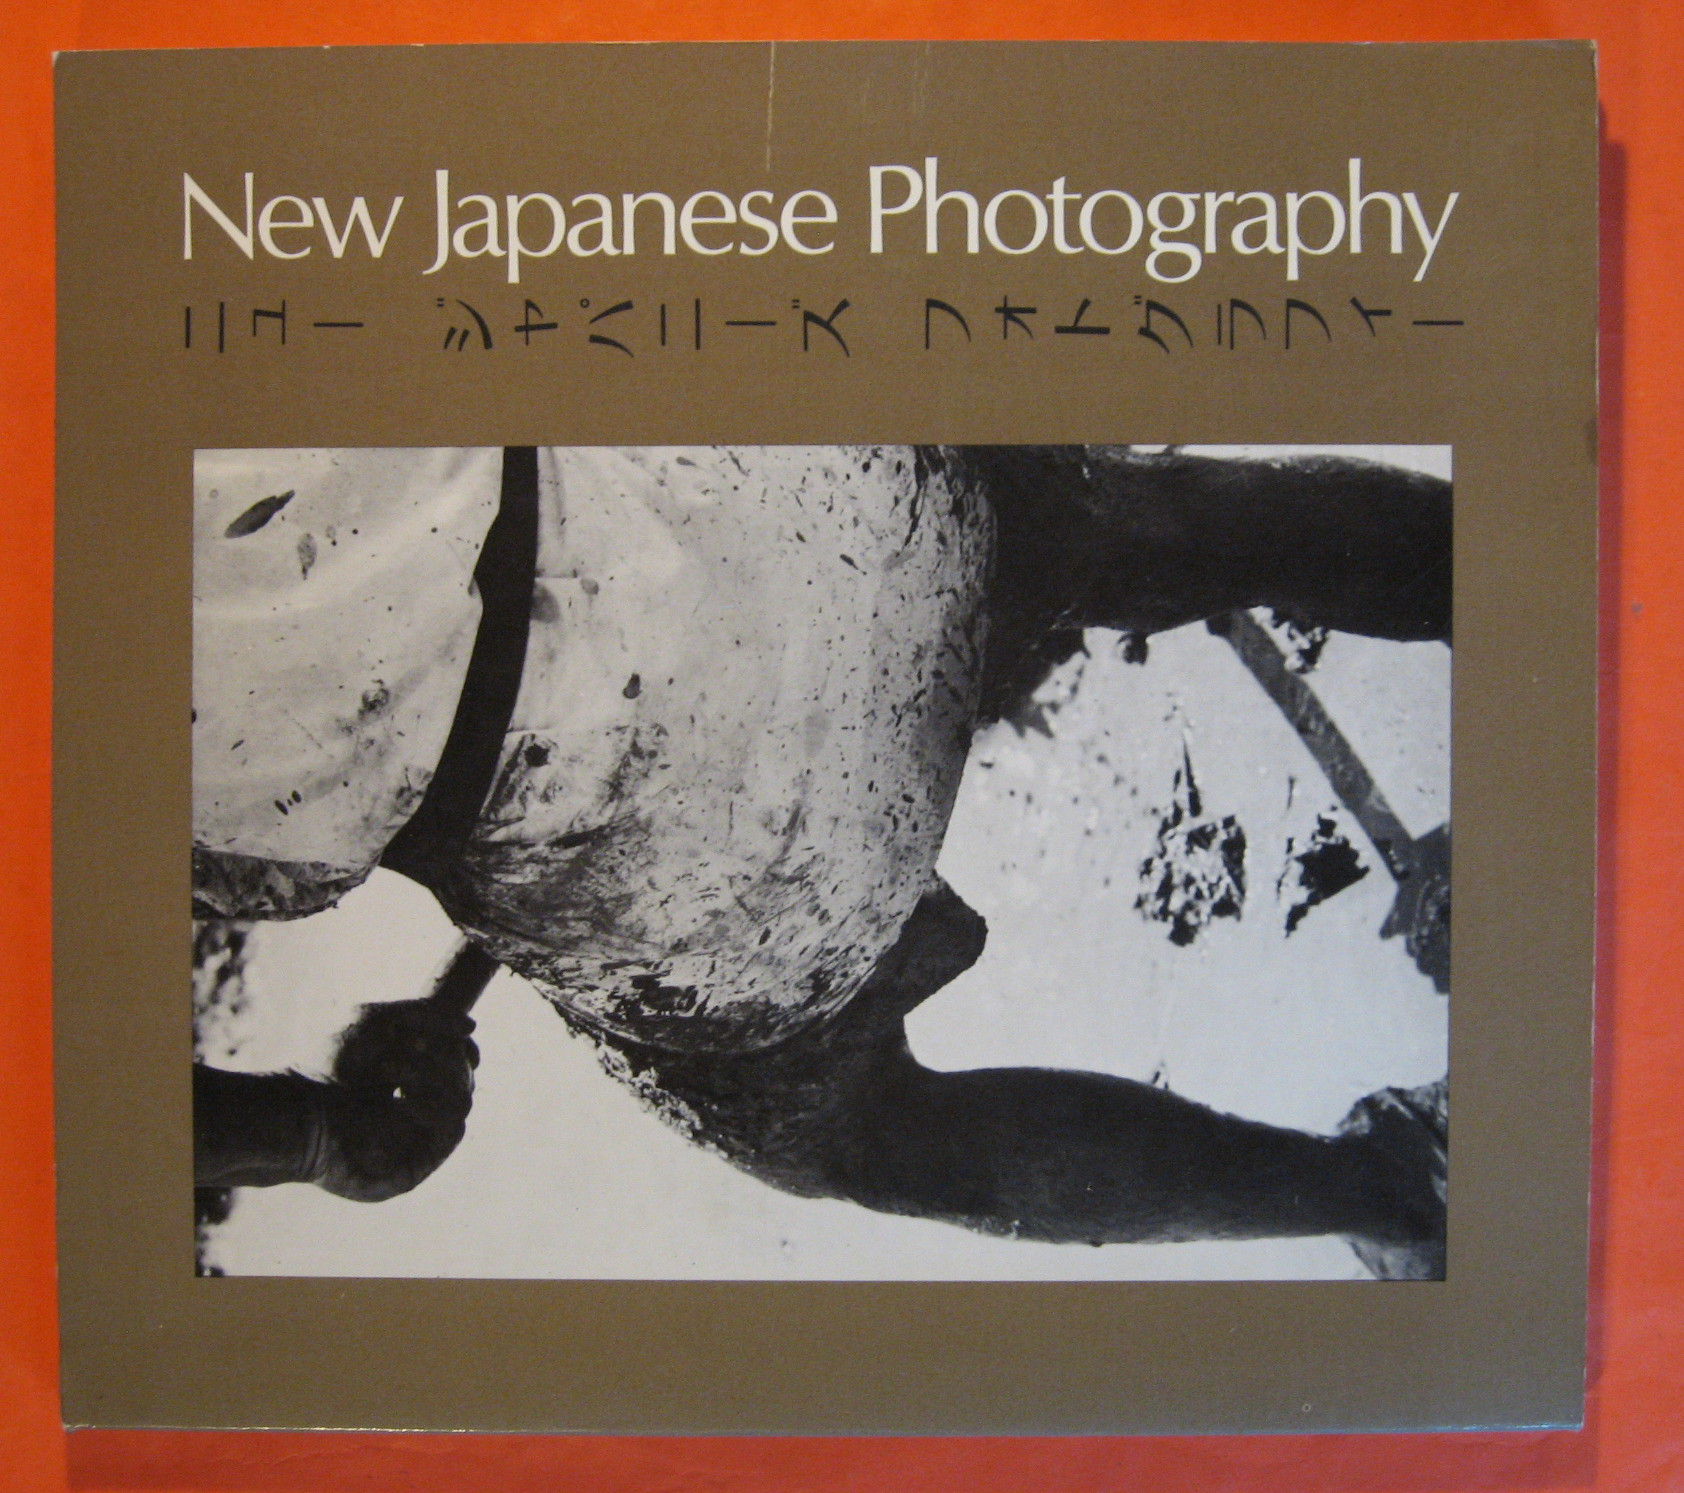 New Japanese Photography, Szarkowski, John, Yamagishi, Shoji